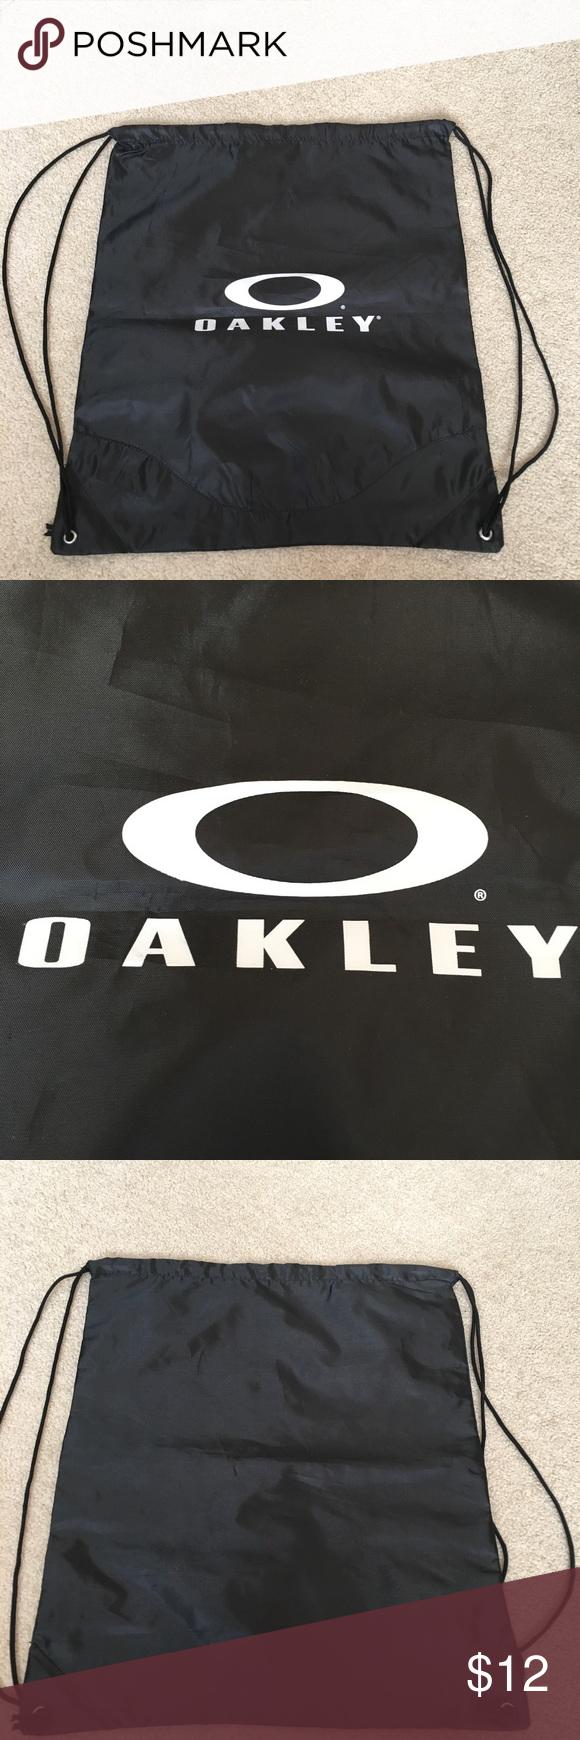 Oakley Black W White Logo Drawstring Backpack Oakley Oakley Bag Drawstring Backpack